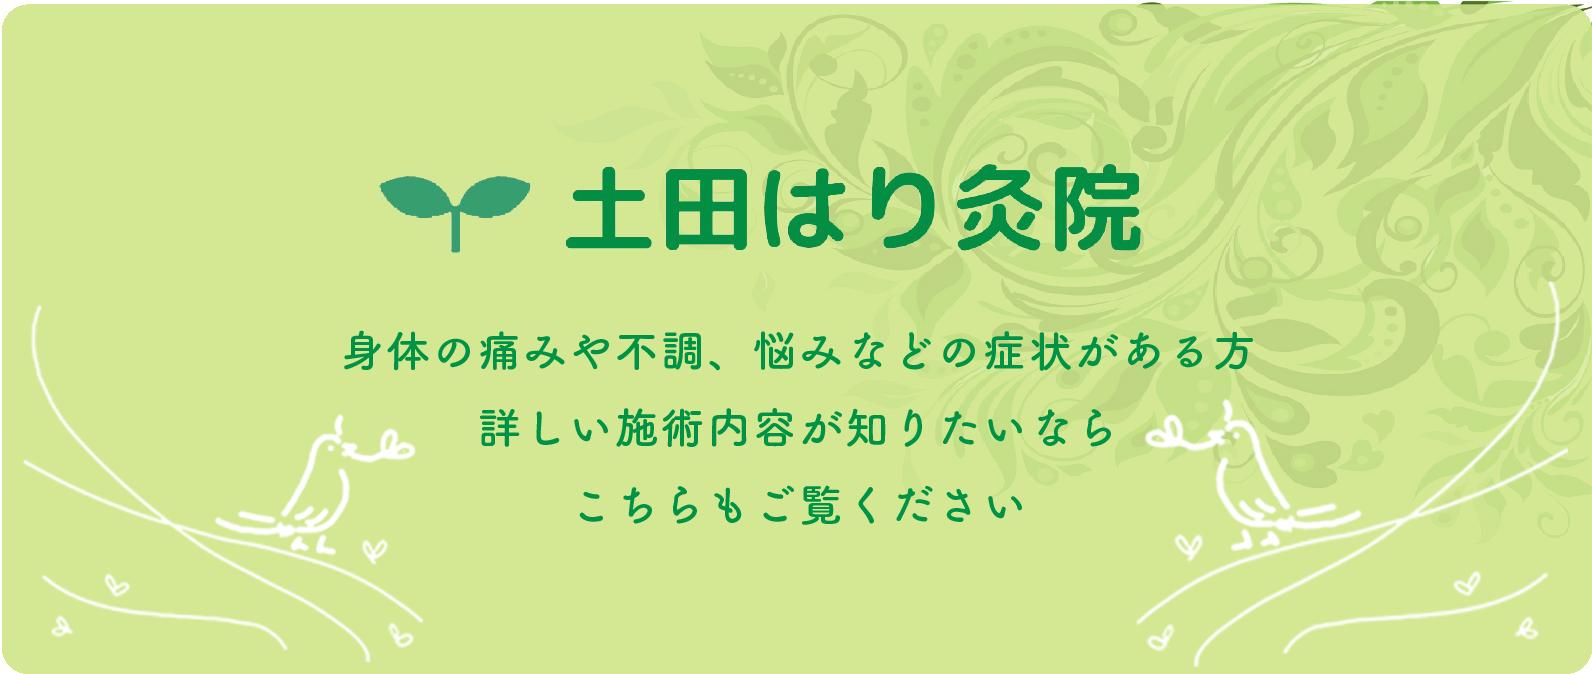 banar 36 - メニュー・料金